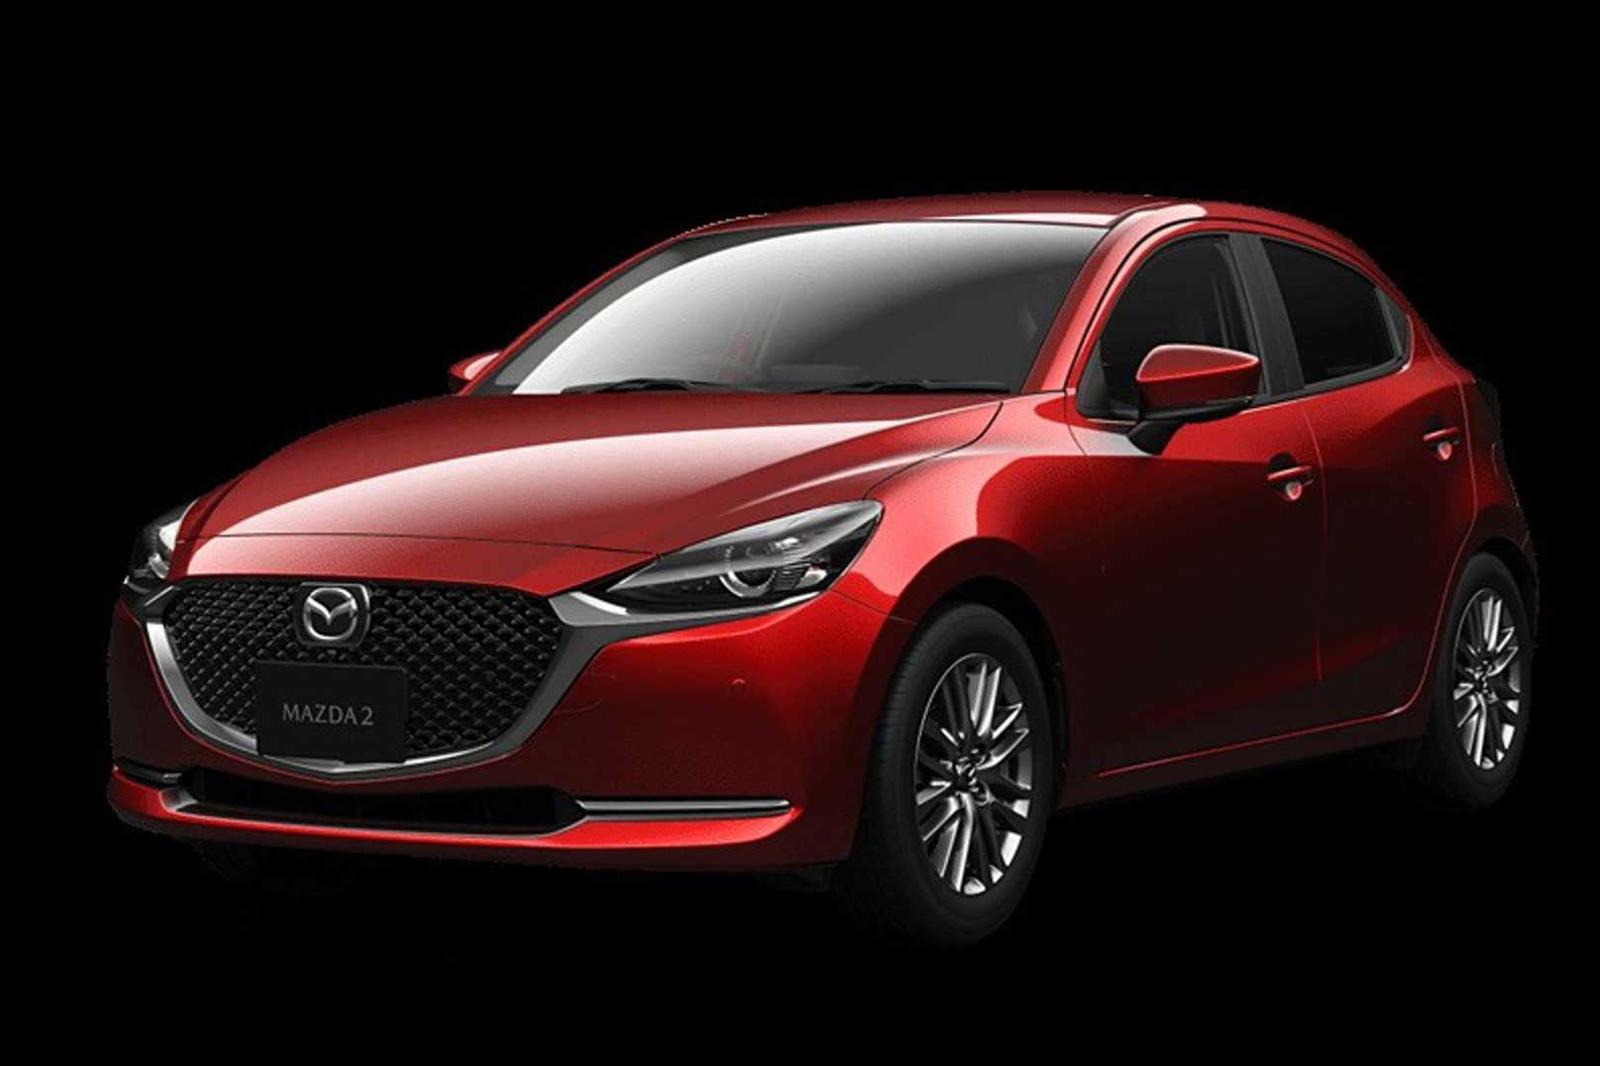 Kelebihan Kekurangan Mazda2 2020 Review